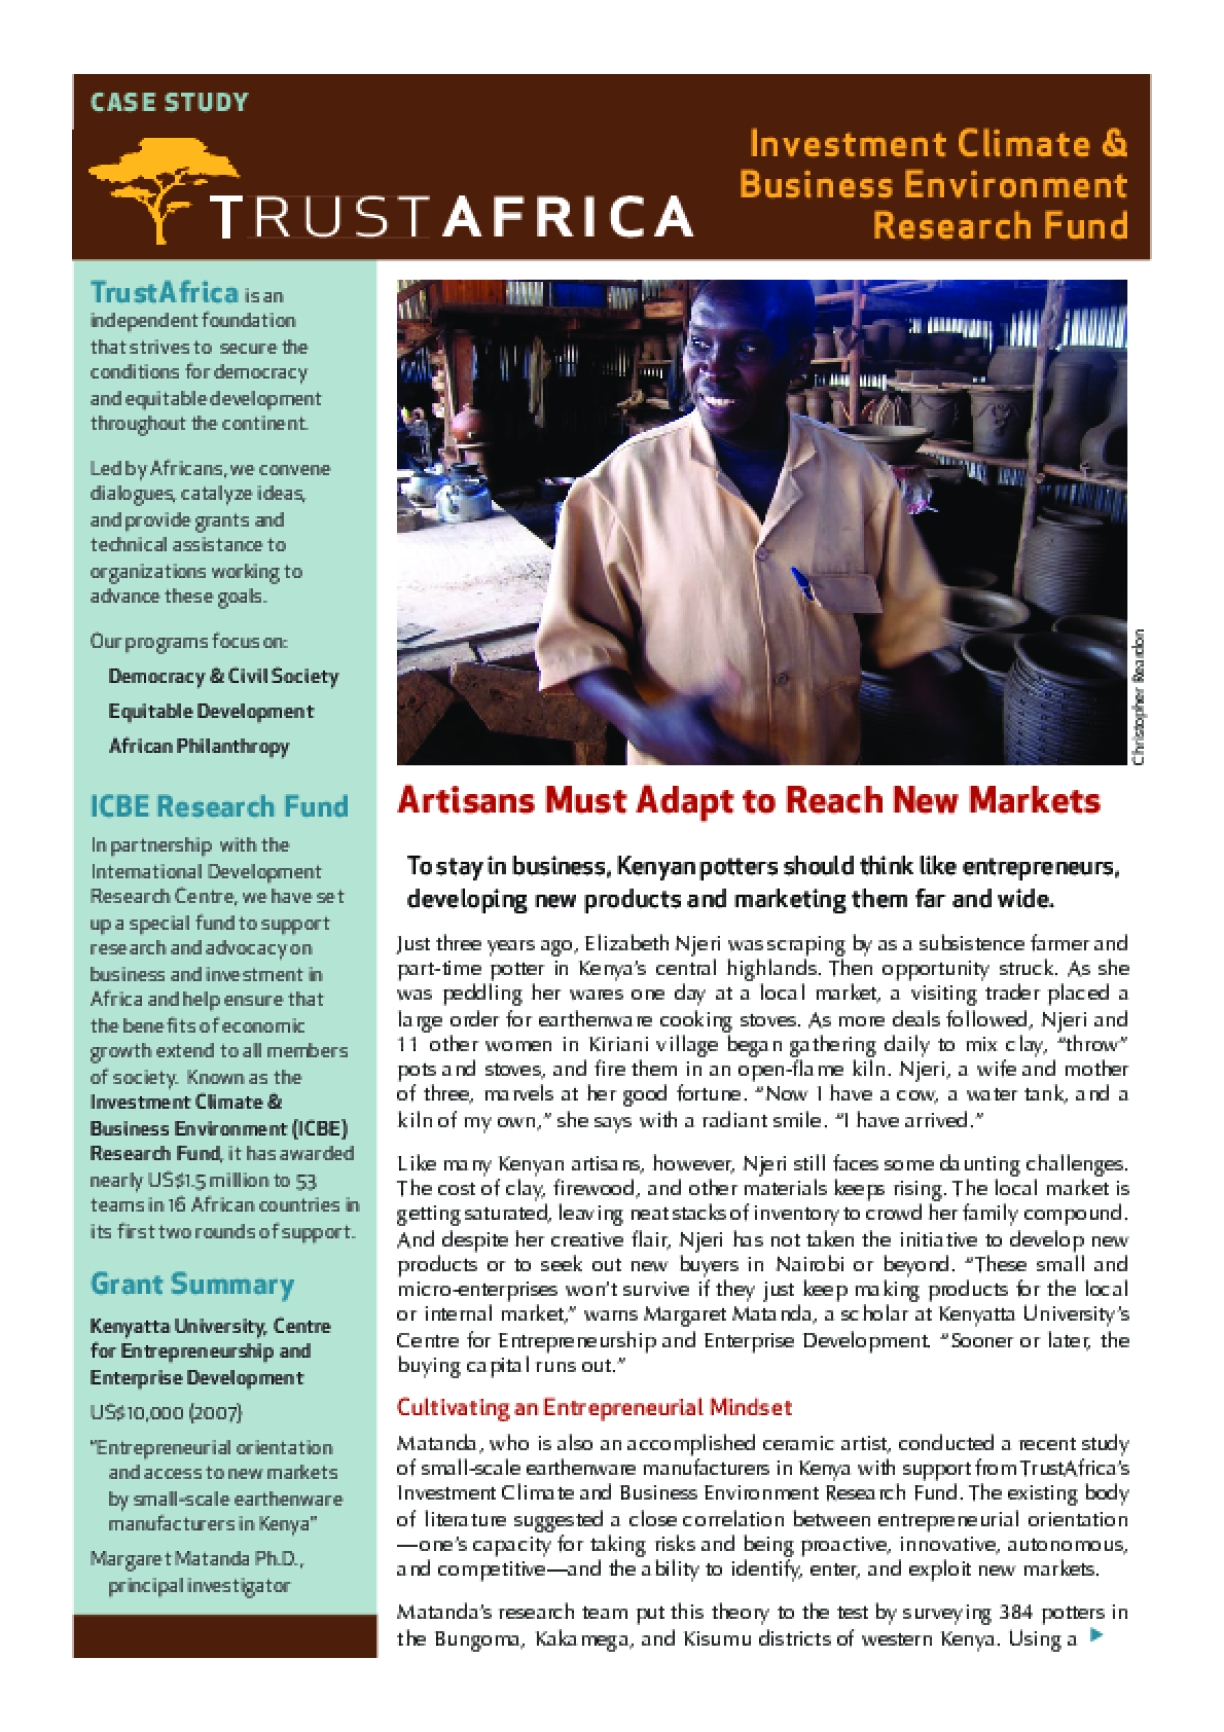 Artisans Must Adapt to Reach New Markets